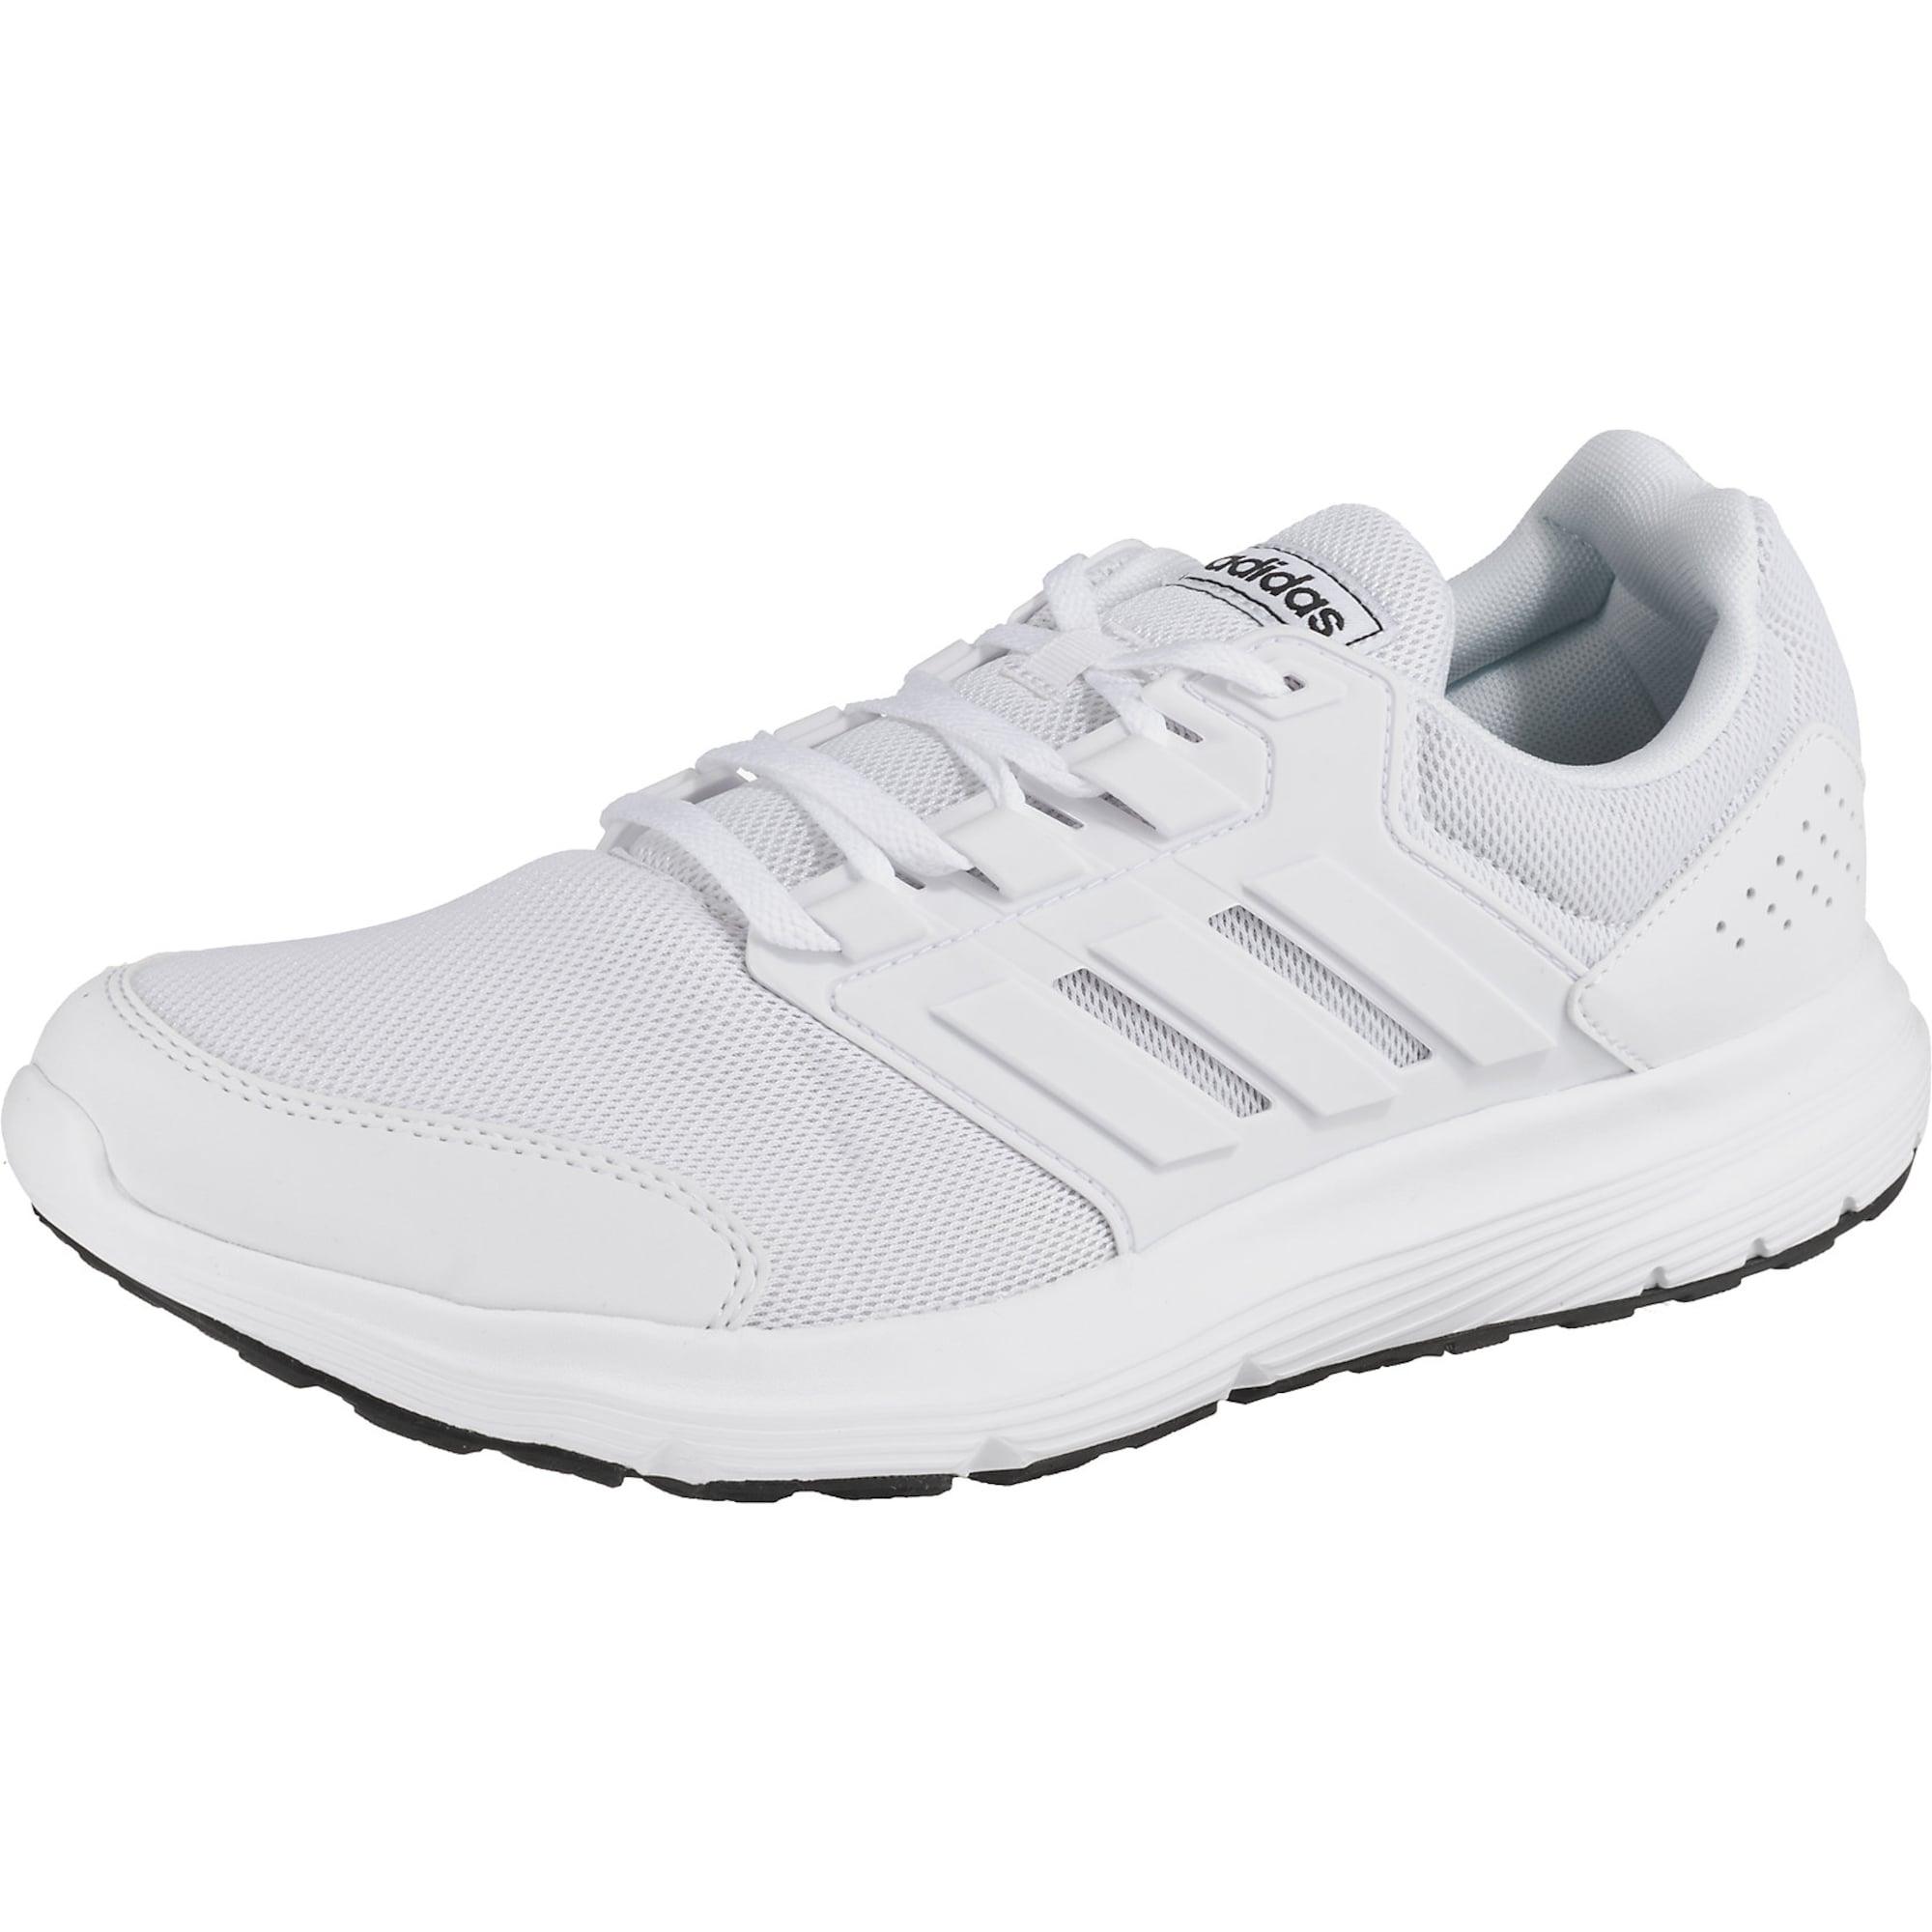 ADIDAS PERFORMANCE Bėgimo batai 'Galaxy 4' balta